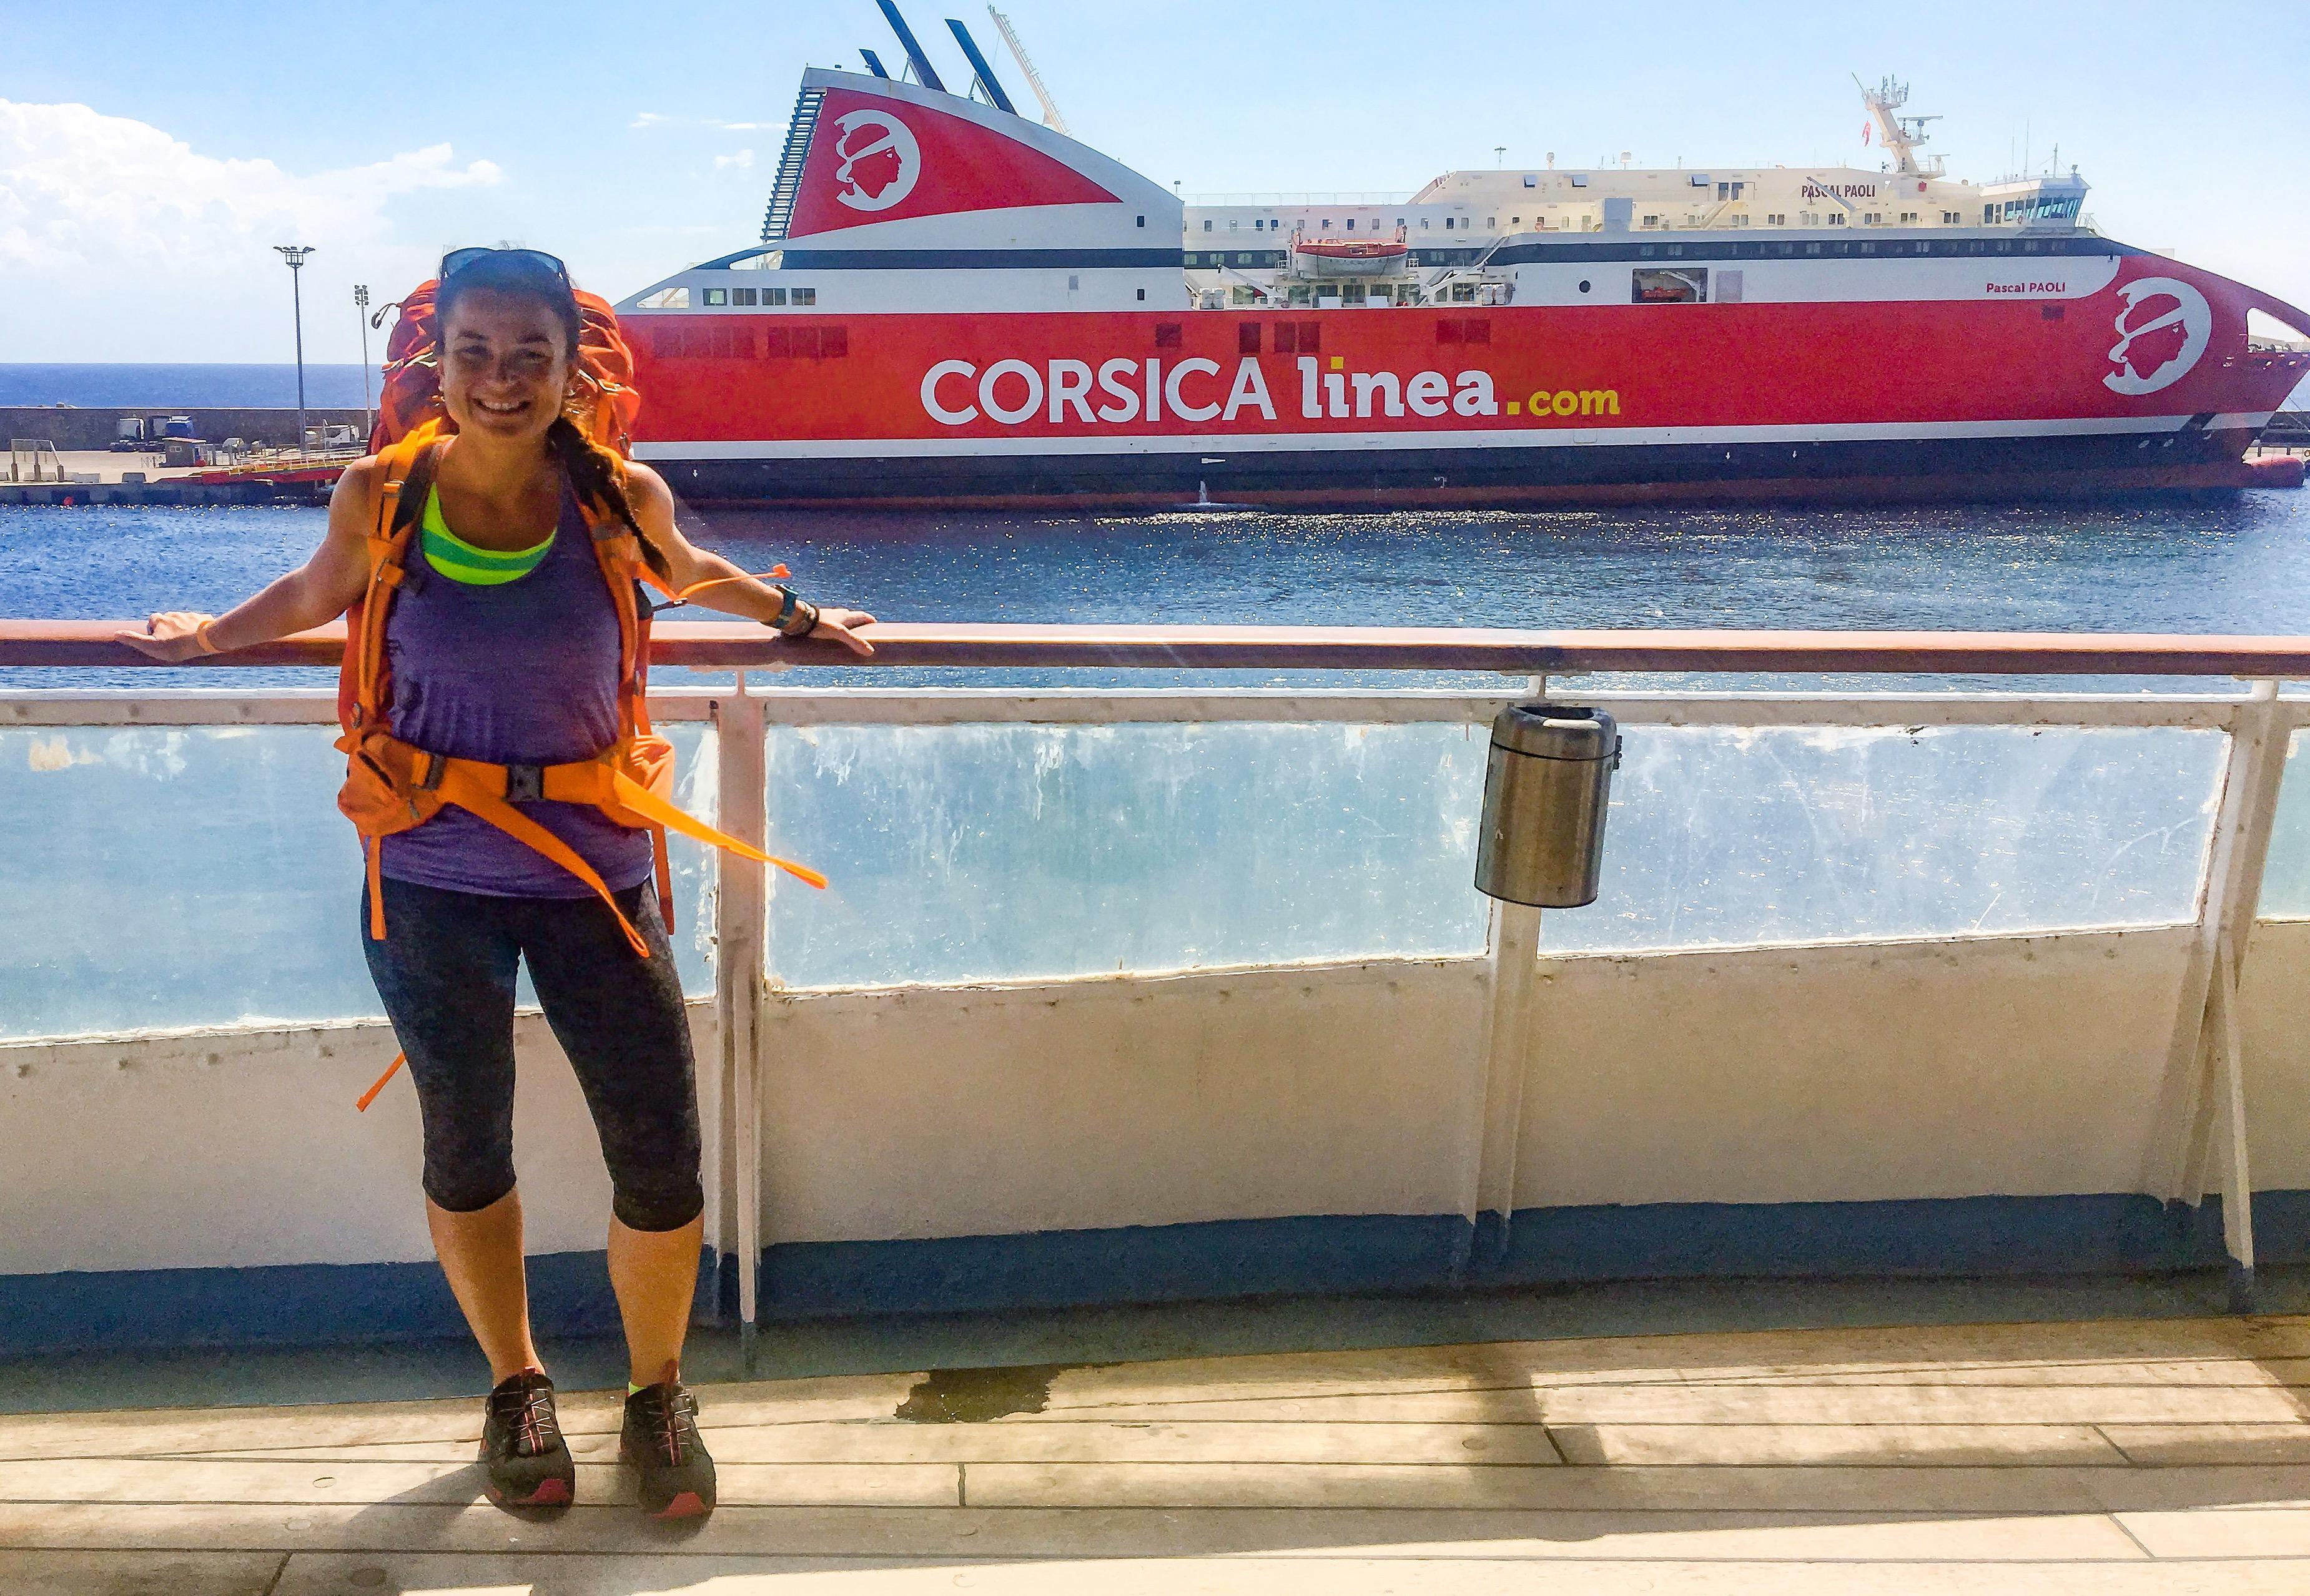 Partenza per la Corsica: GR20